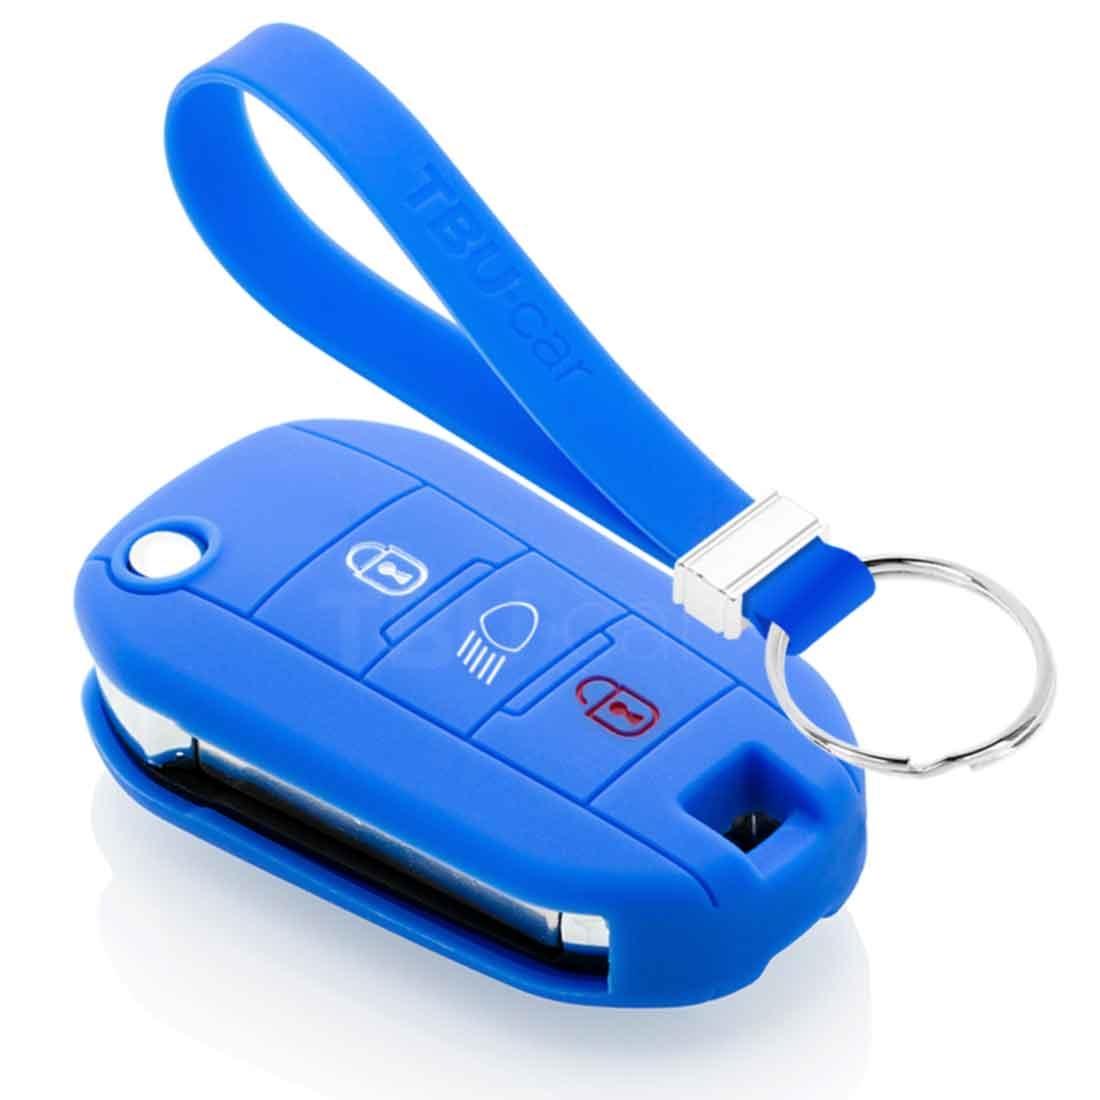 TBU car TBU car Sleutel cover compatibel met Citroën - Silicone sleutelhoesje - beschermhoesje autosleutel - Blauw